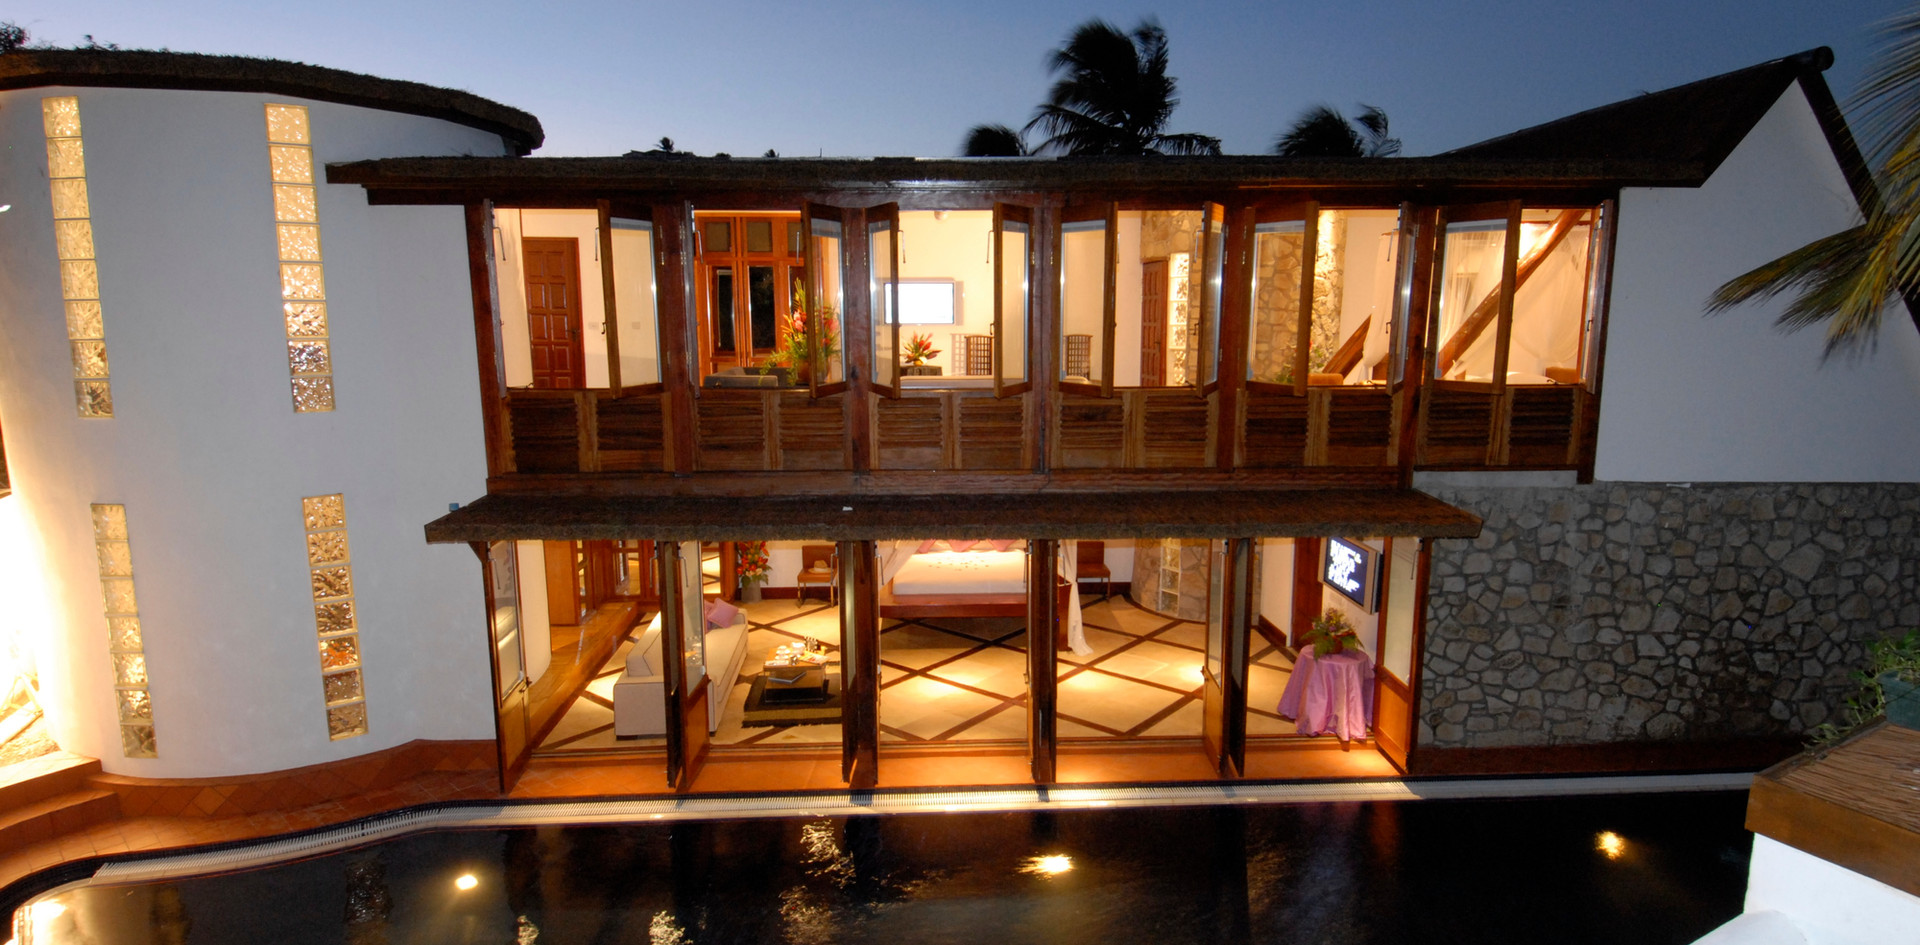 Beach House by night